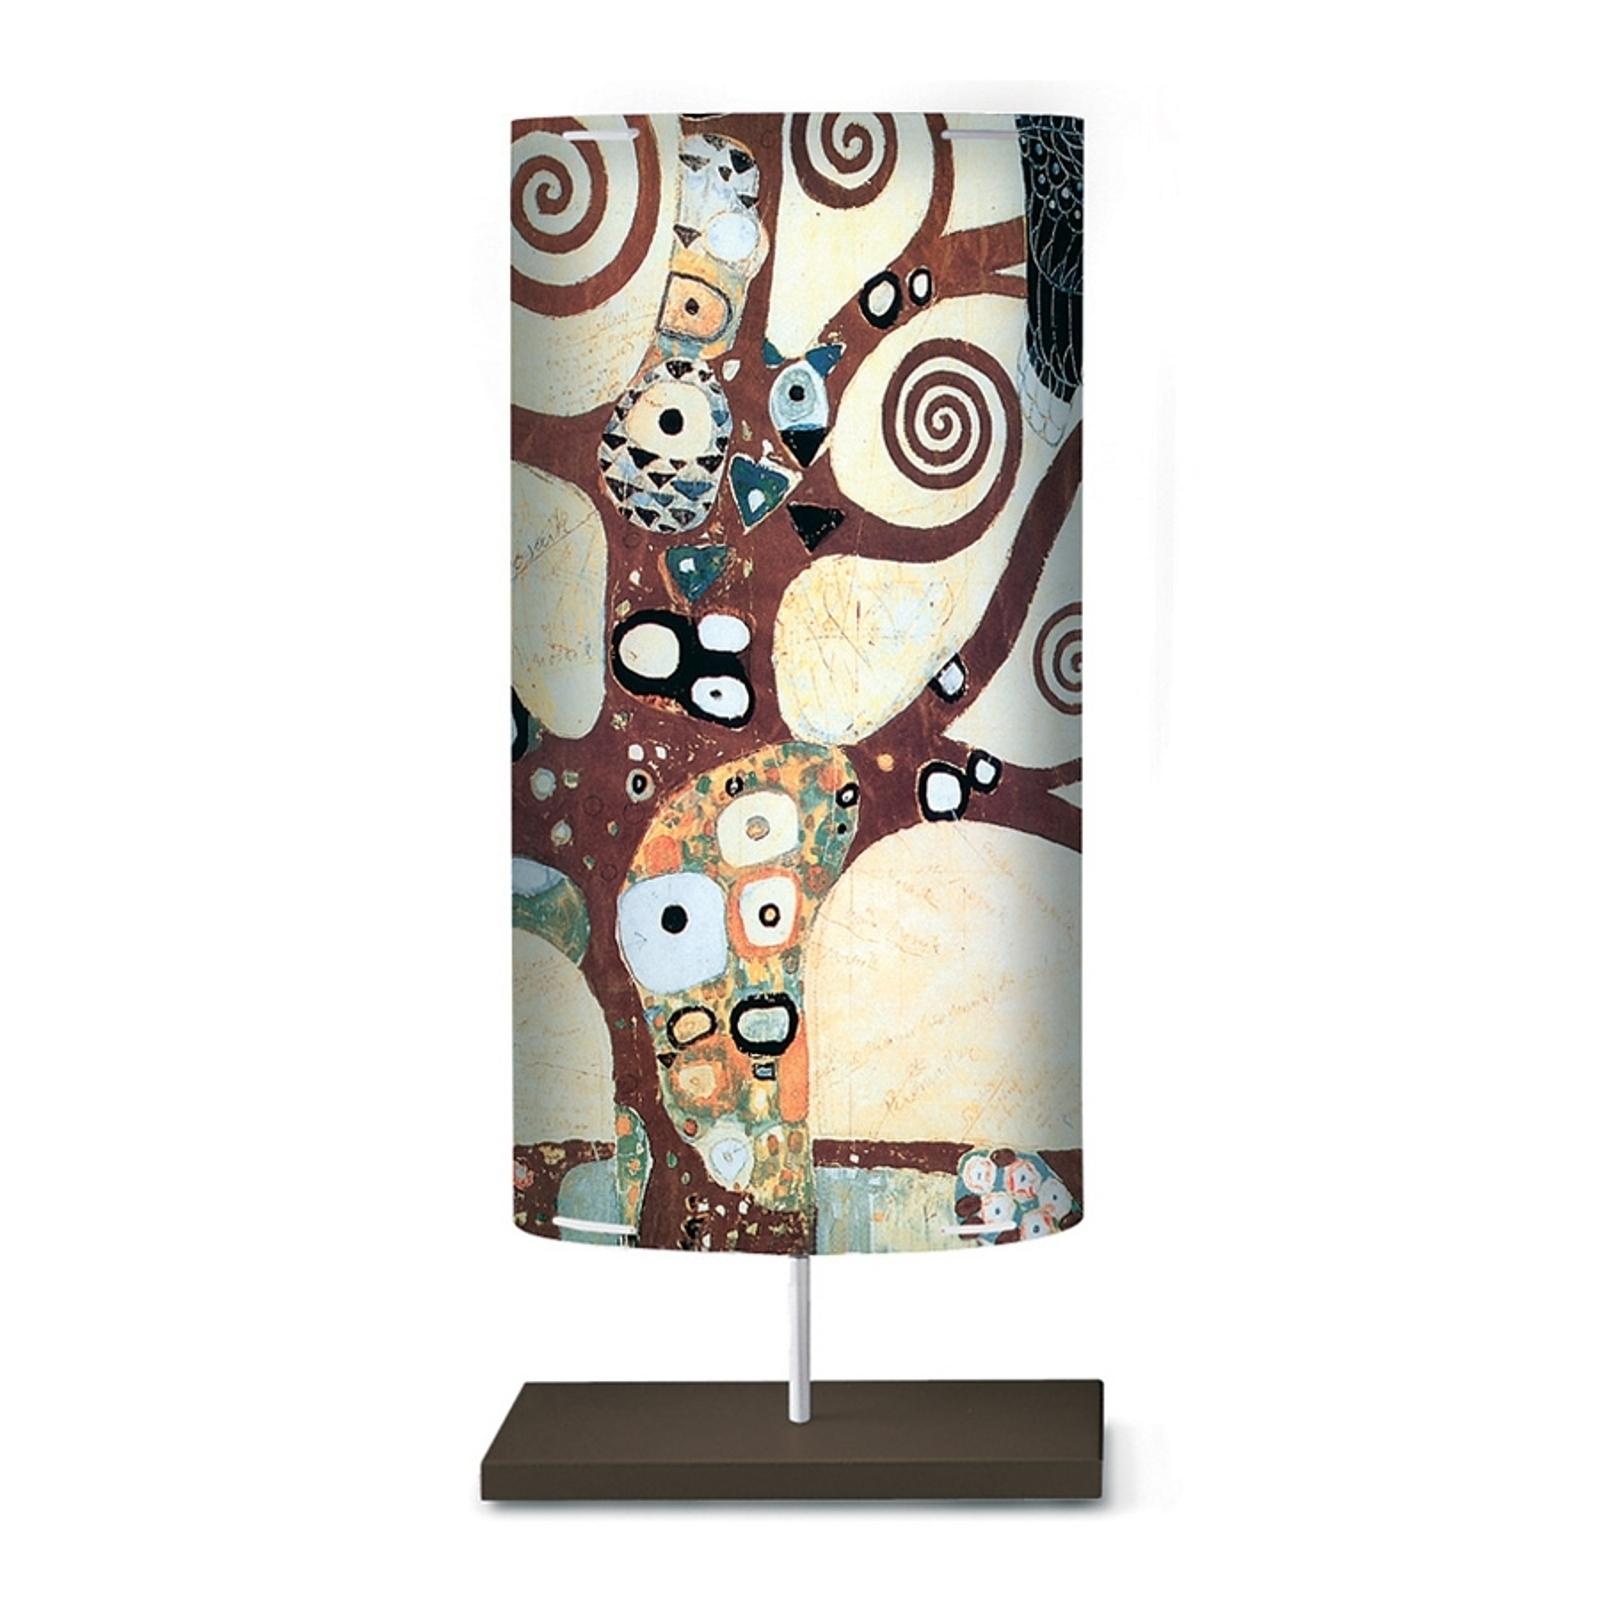 Floor lamp Klimt I with an art motif_1056045_1